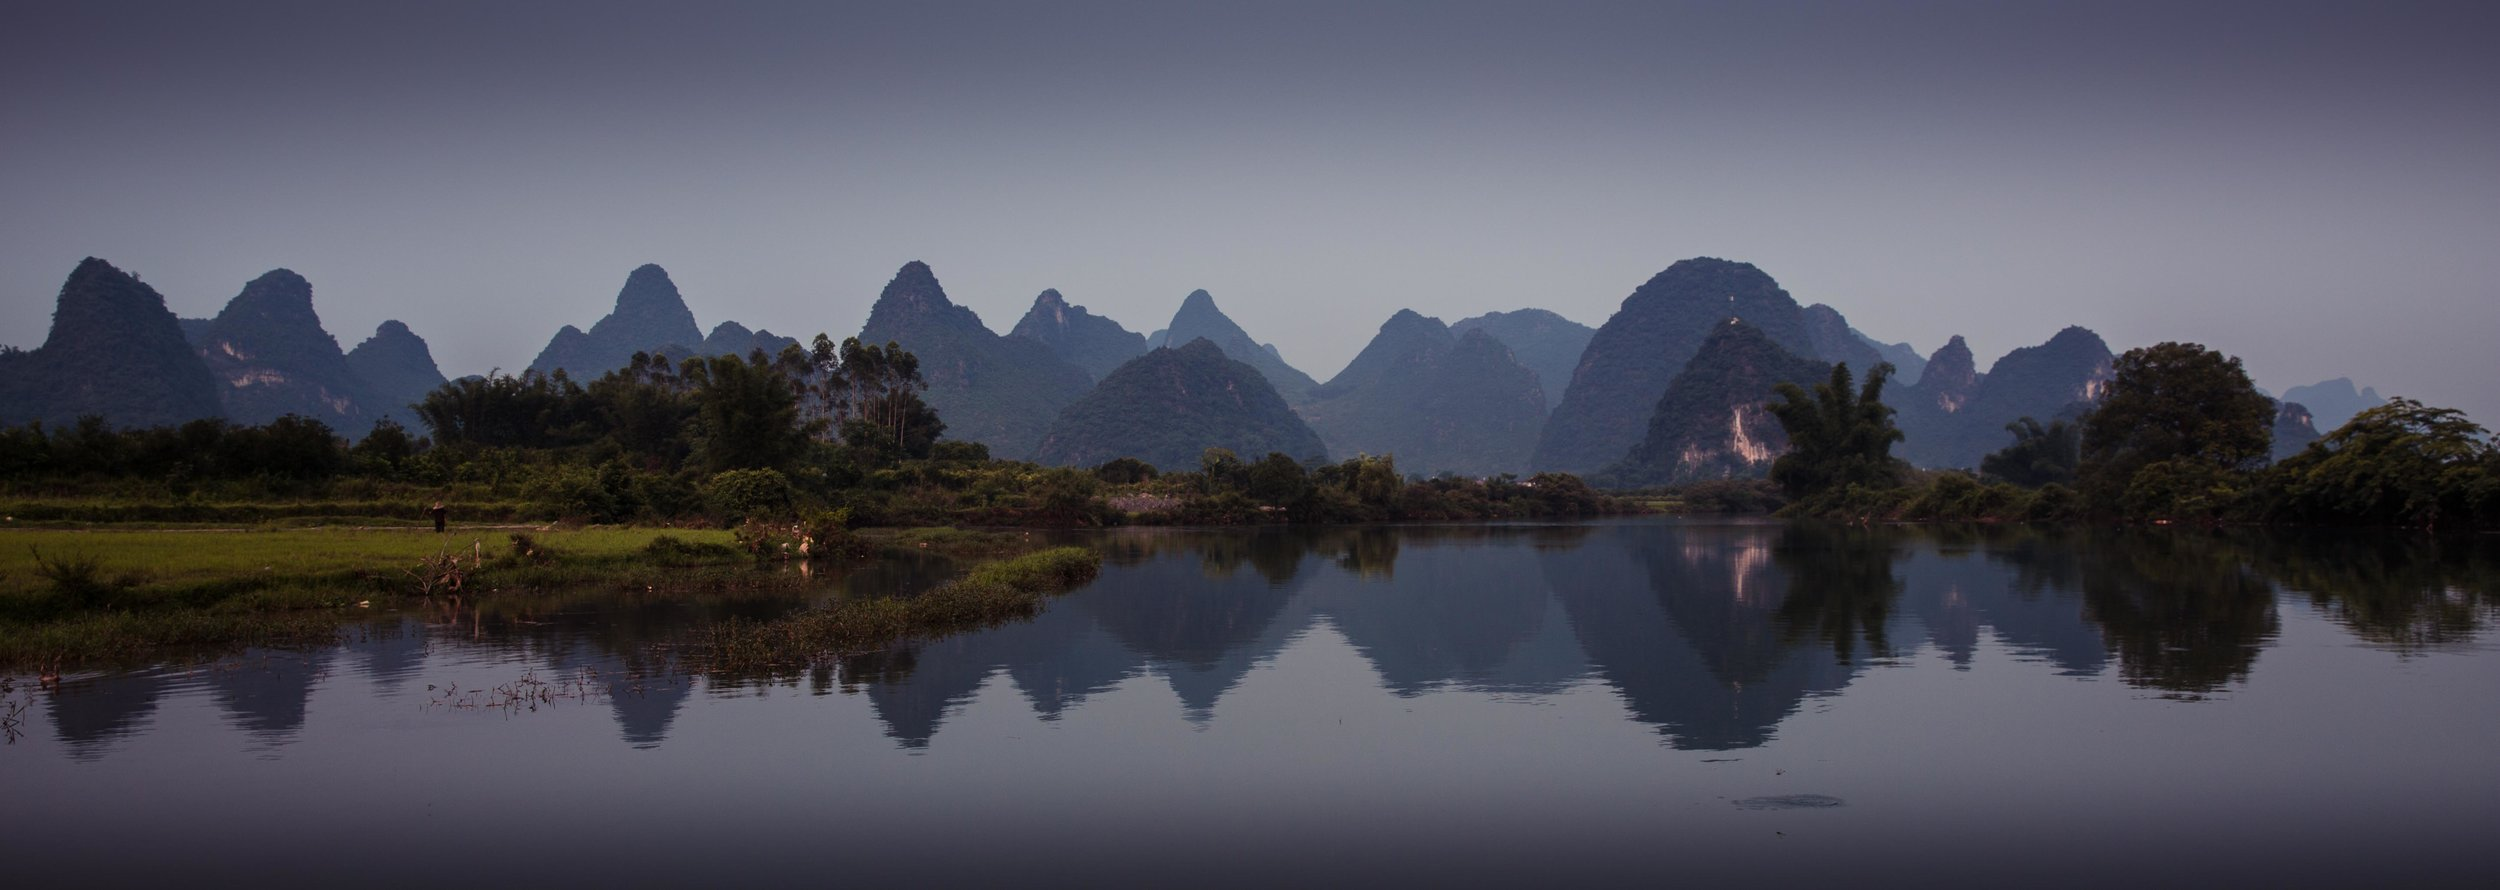 Set J - Yu Long River-221.jpg